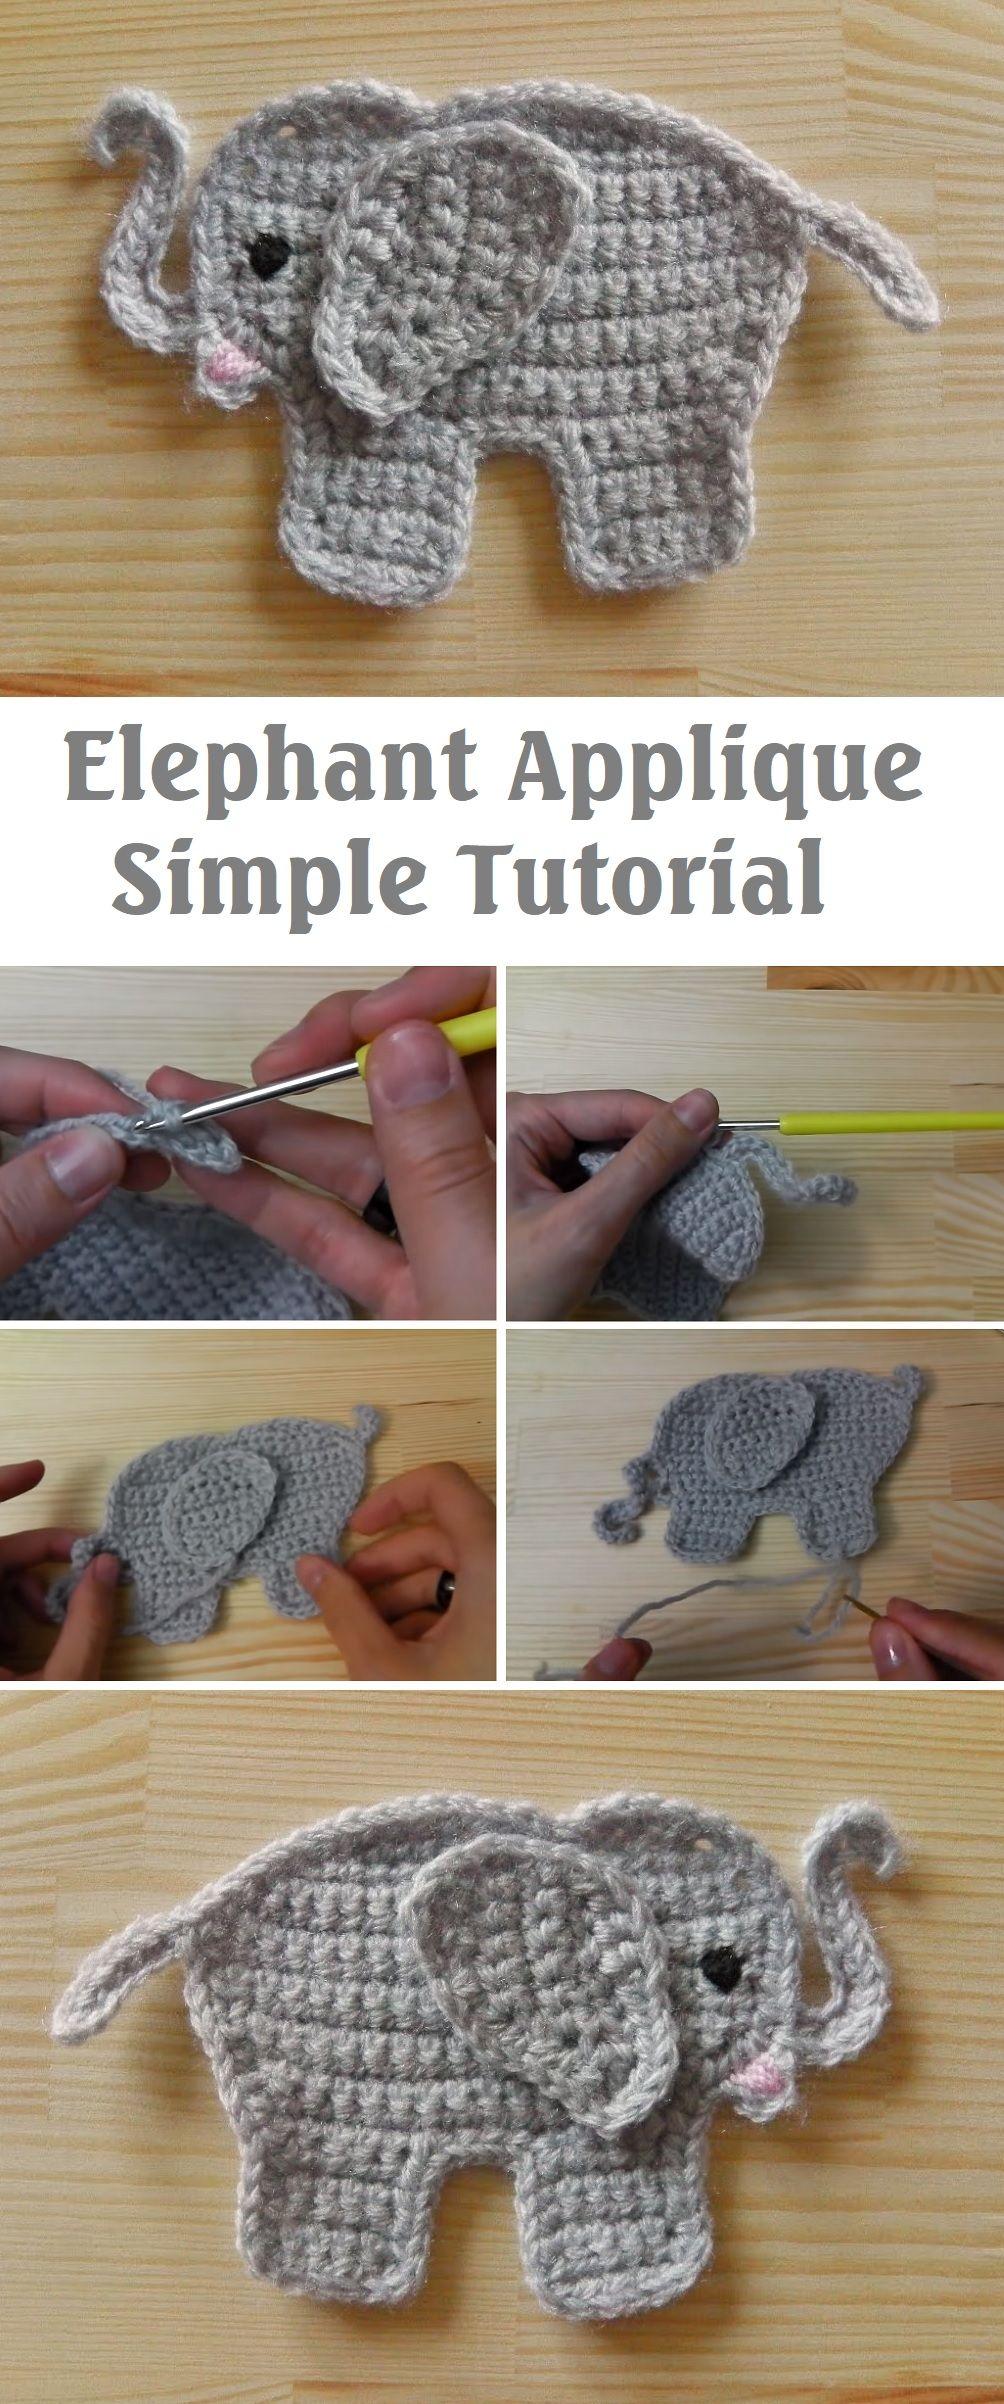 Crochet Elephant Applique – Very Easy! – Handmade paris #crochetelephantpattern